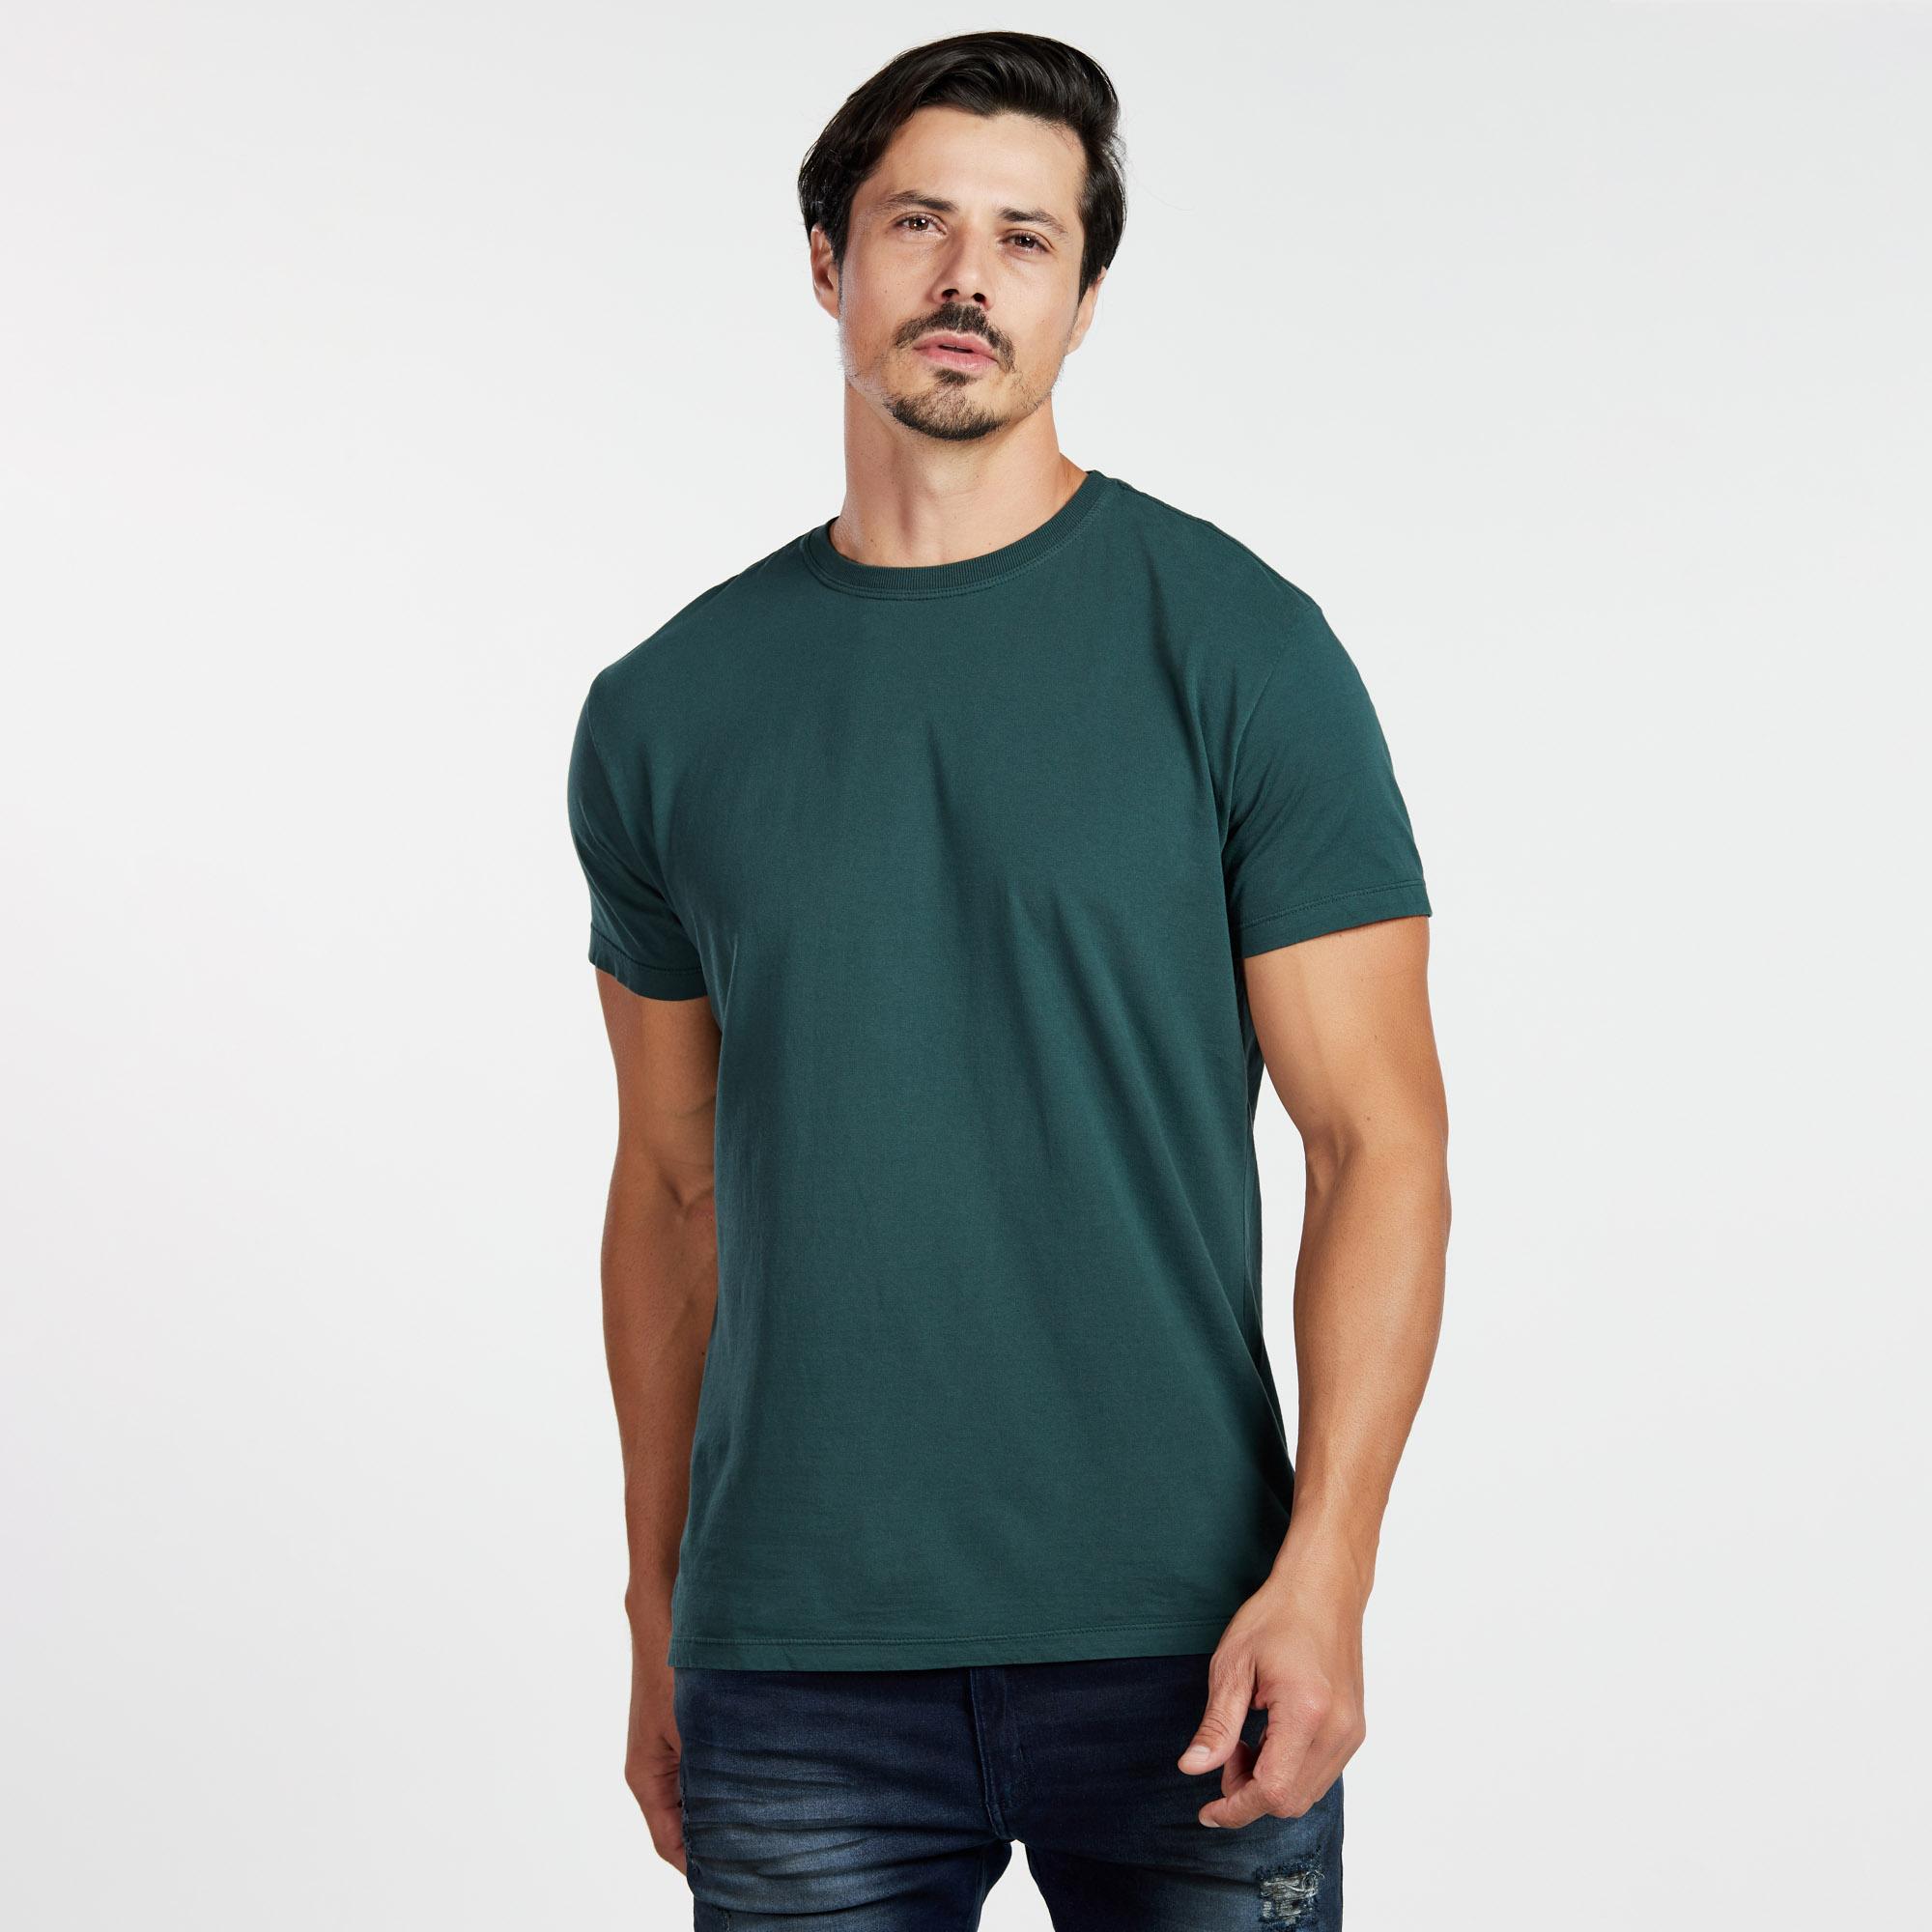 Camiseta Masculina Reativo Verde Escuro